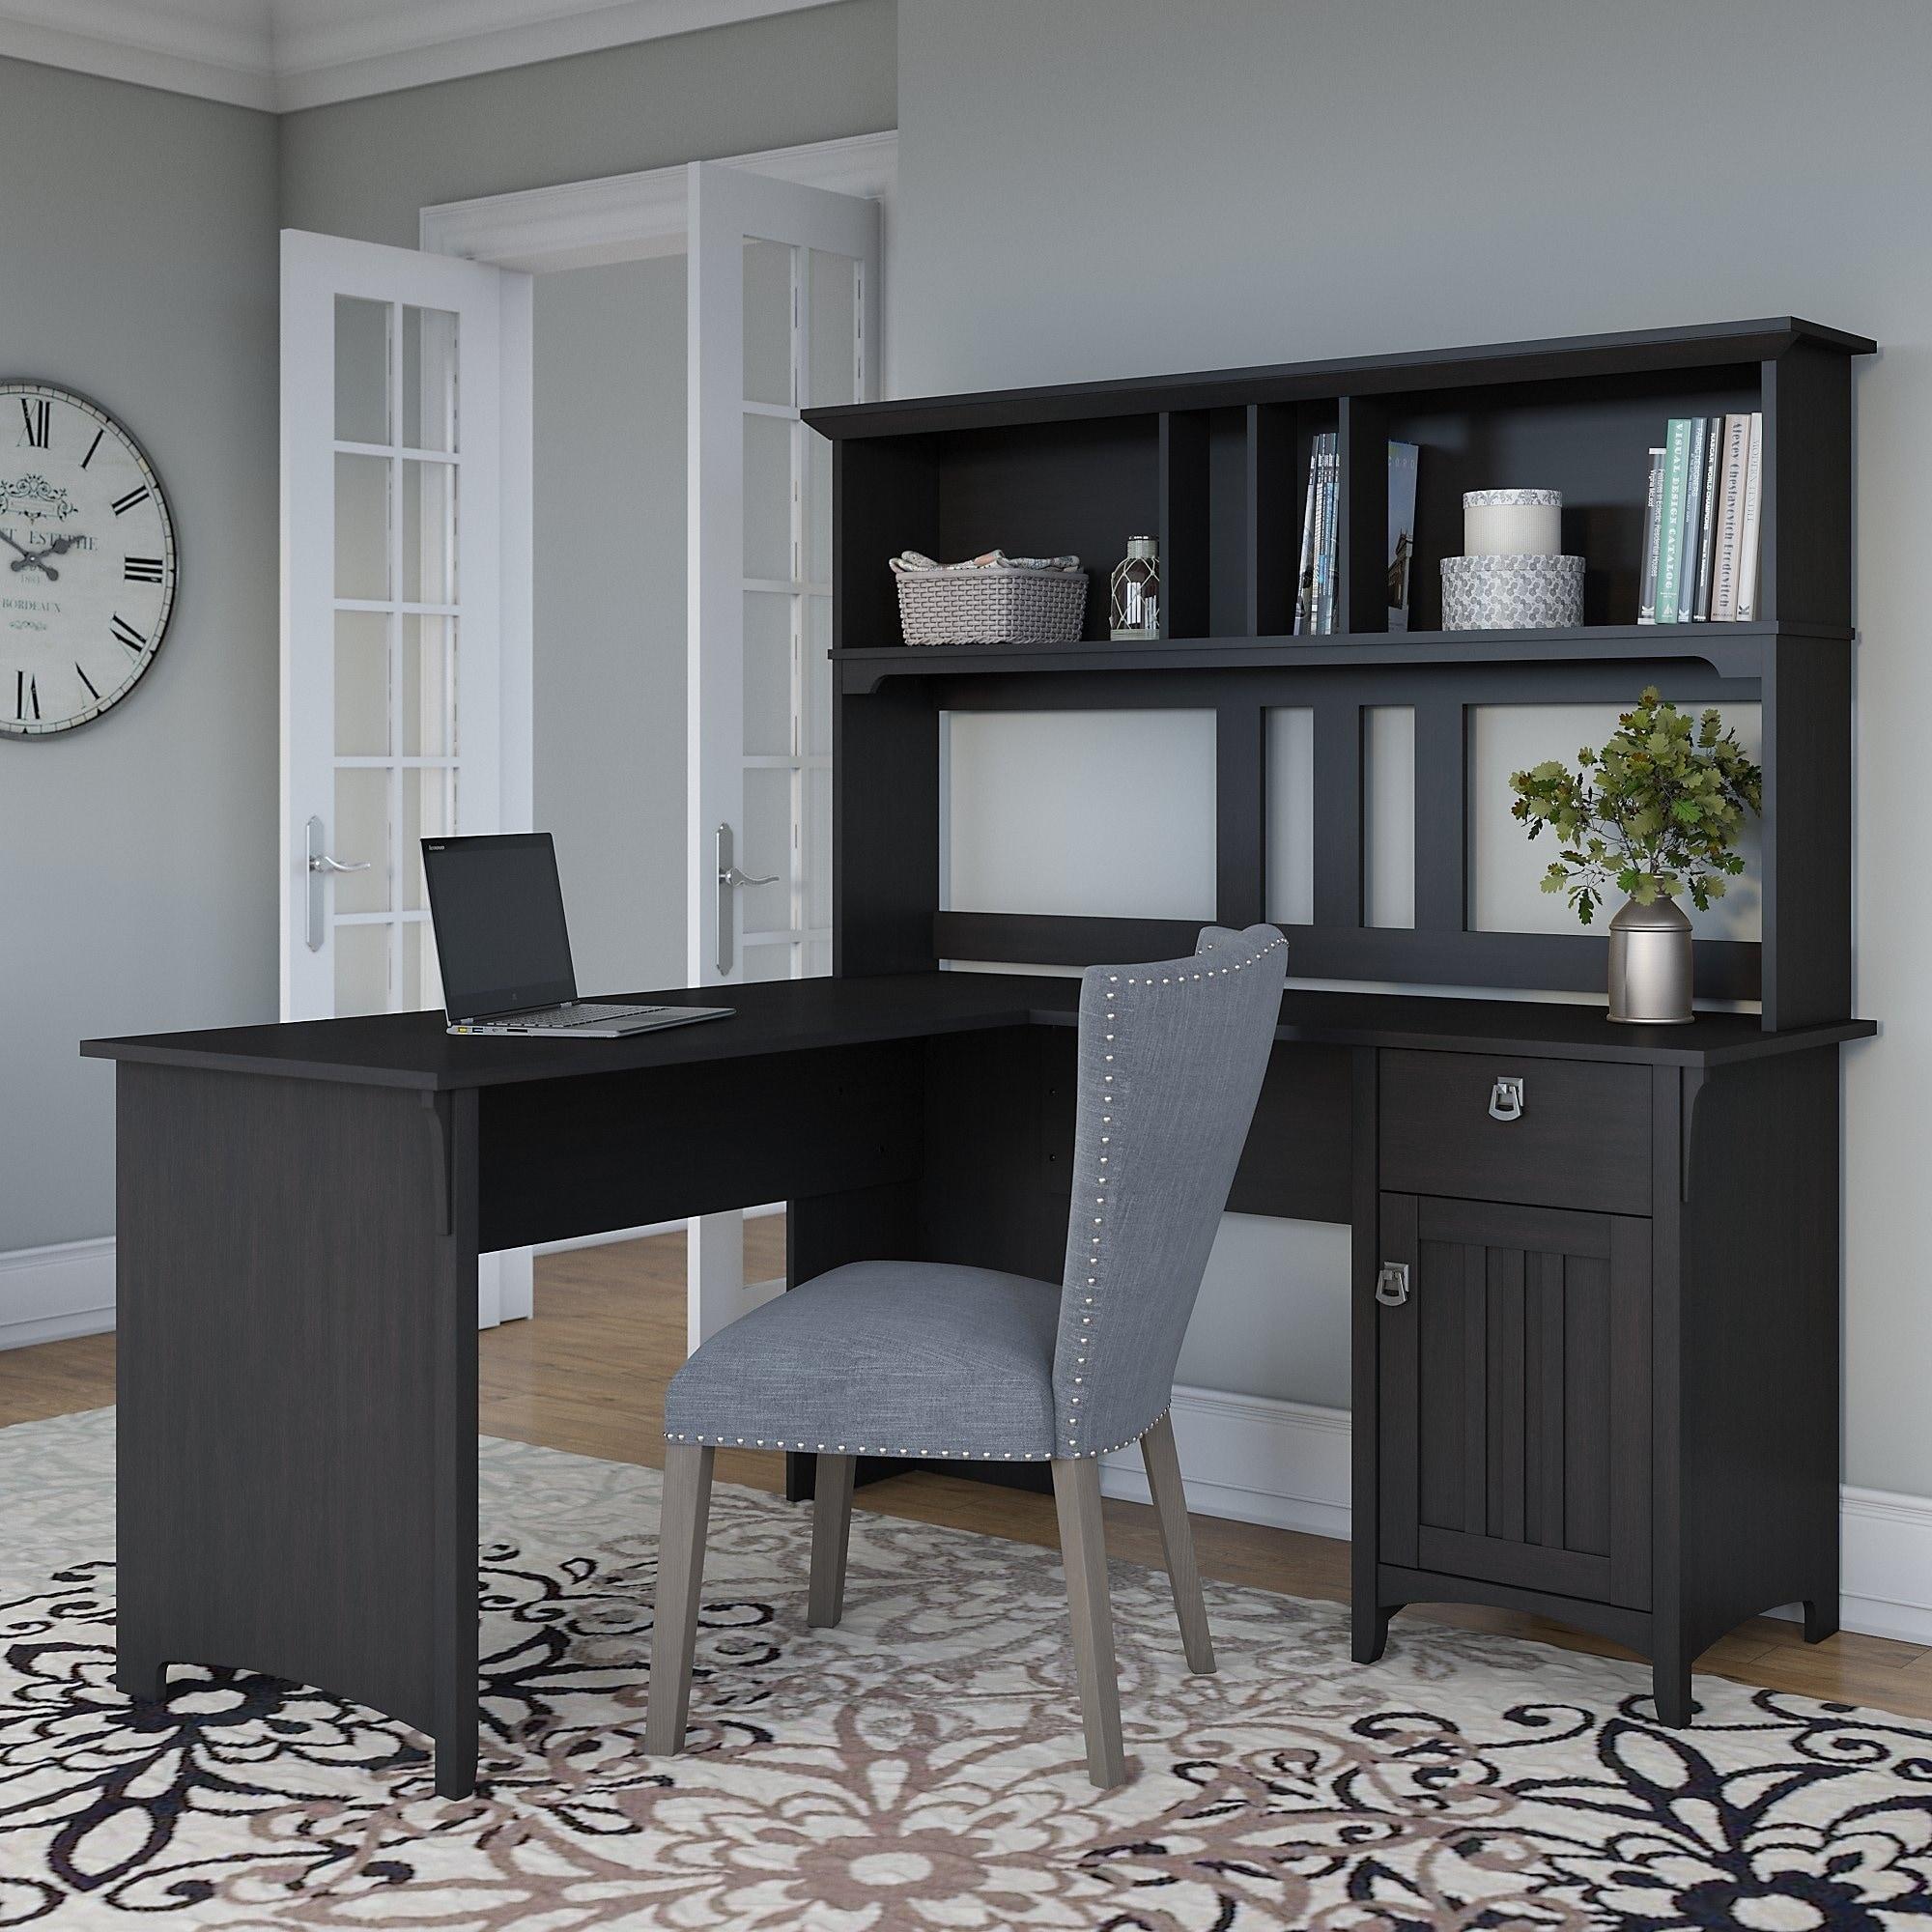 Shop Black Friday Deals On The Gray Barn Lowbridge 60 Inch L Shaped Desk With Hutch In Vintage Black Overstock 26263297